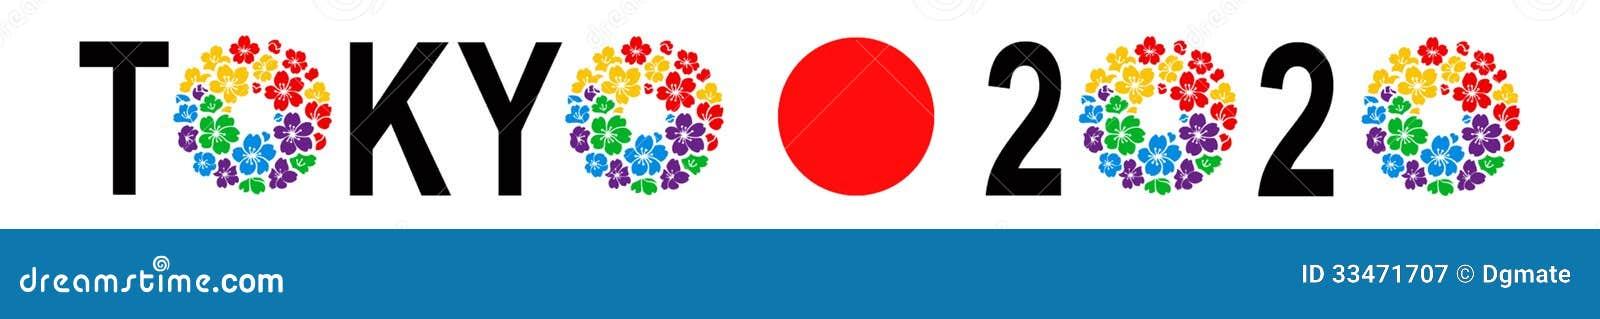 Tokyo Olympics 2020 logo editorial photography ...